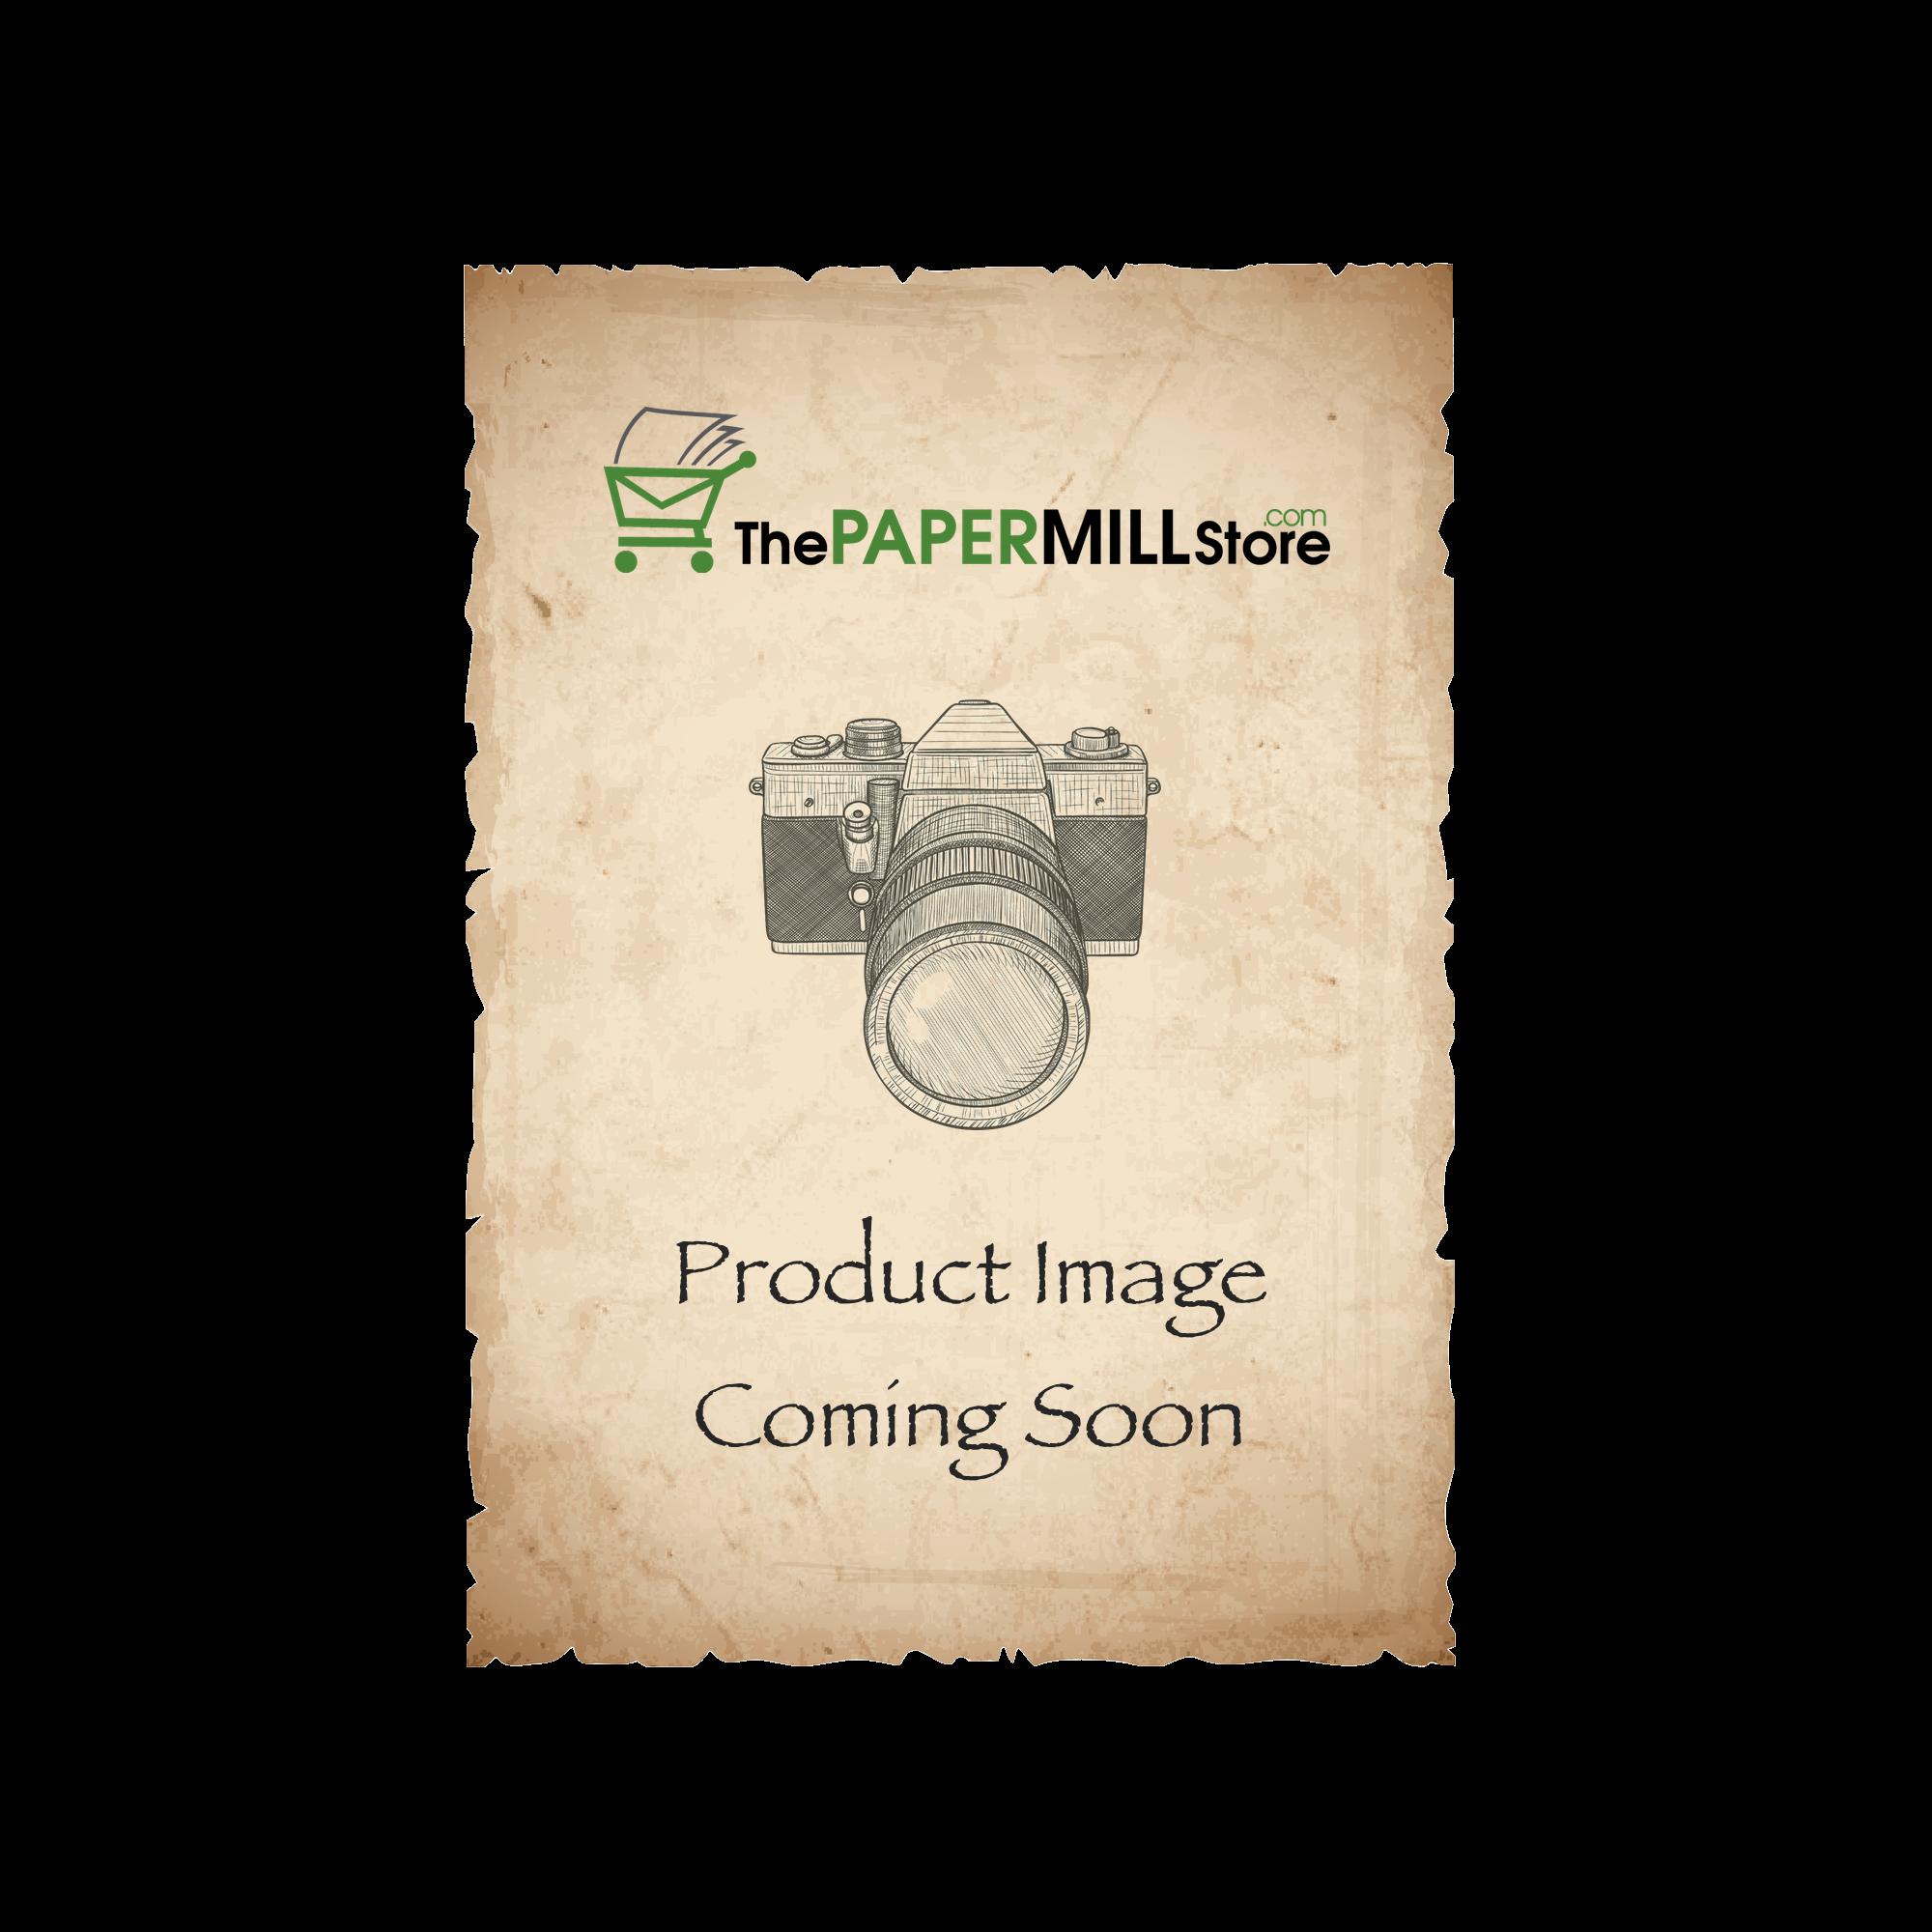 Pocket Folder - Presentation Folders 12 pt Cover HP Indigo & NexPress Certified C/1S White Glossy Finish 12 x 18 Folder 50 per Package